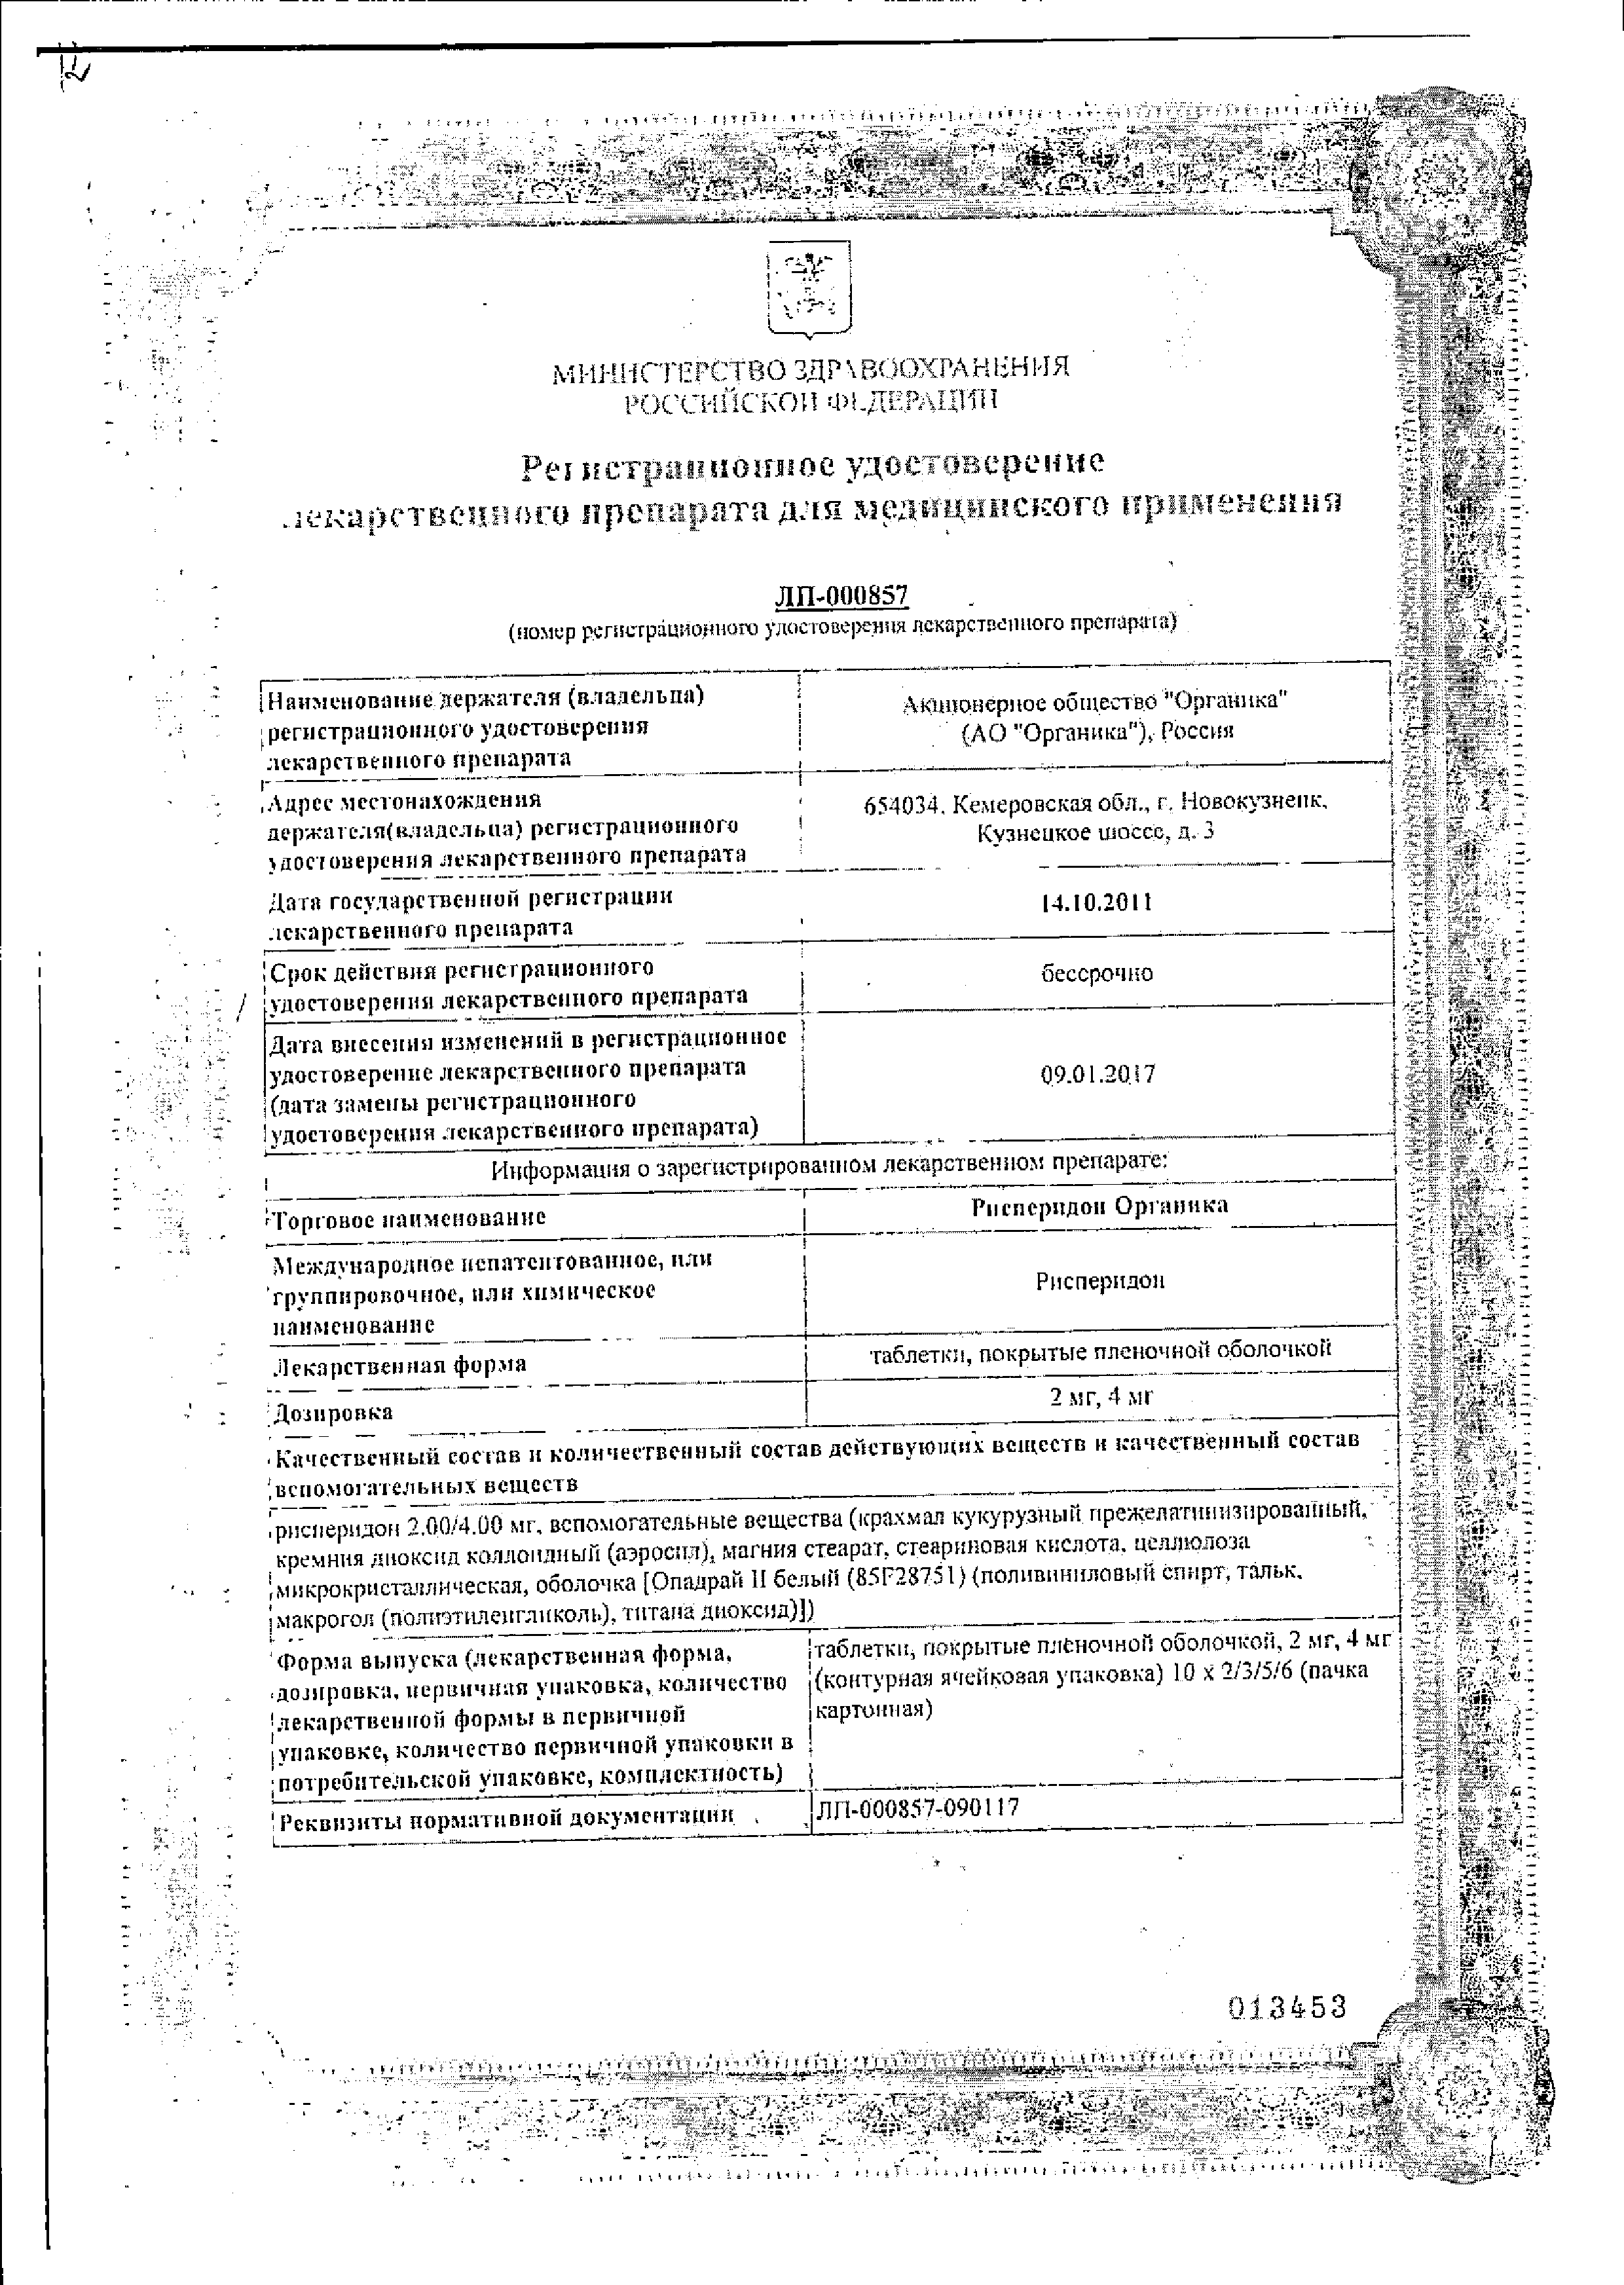 Рисперидон Органика сертификат